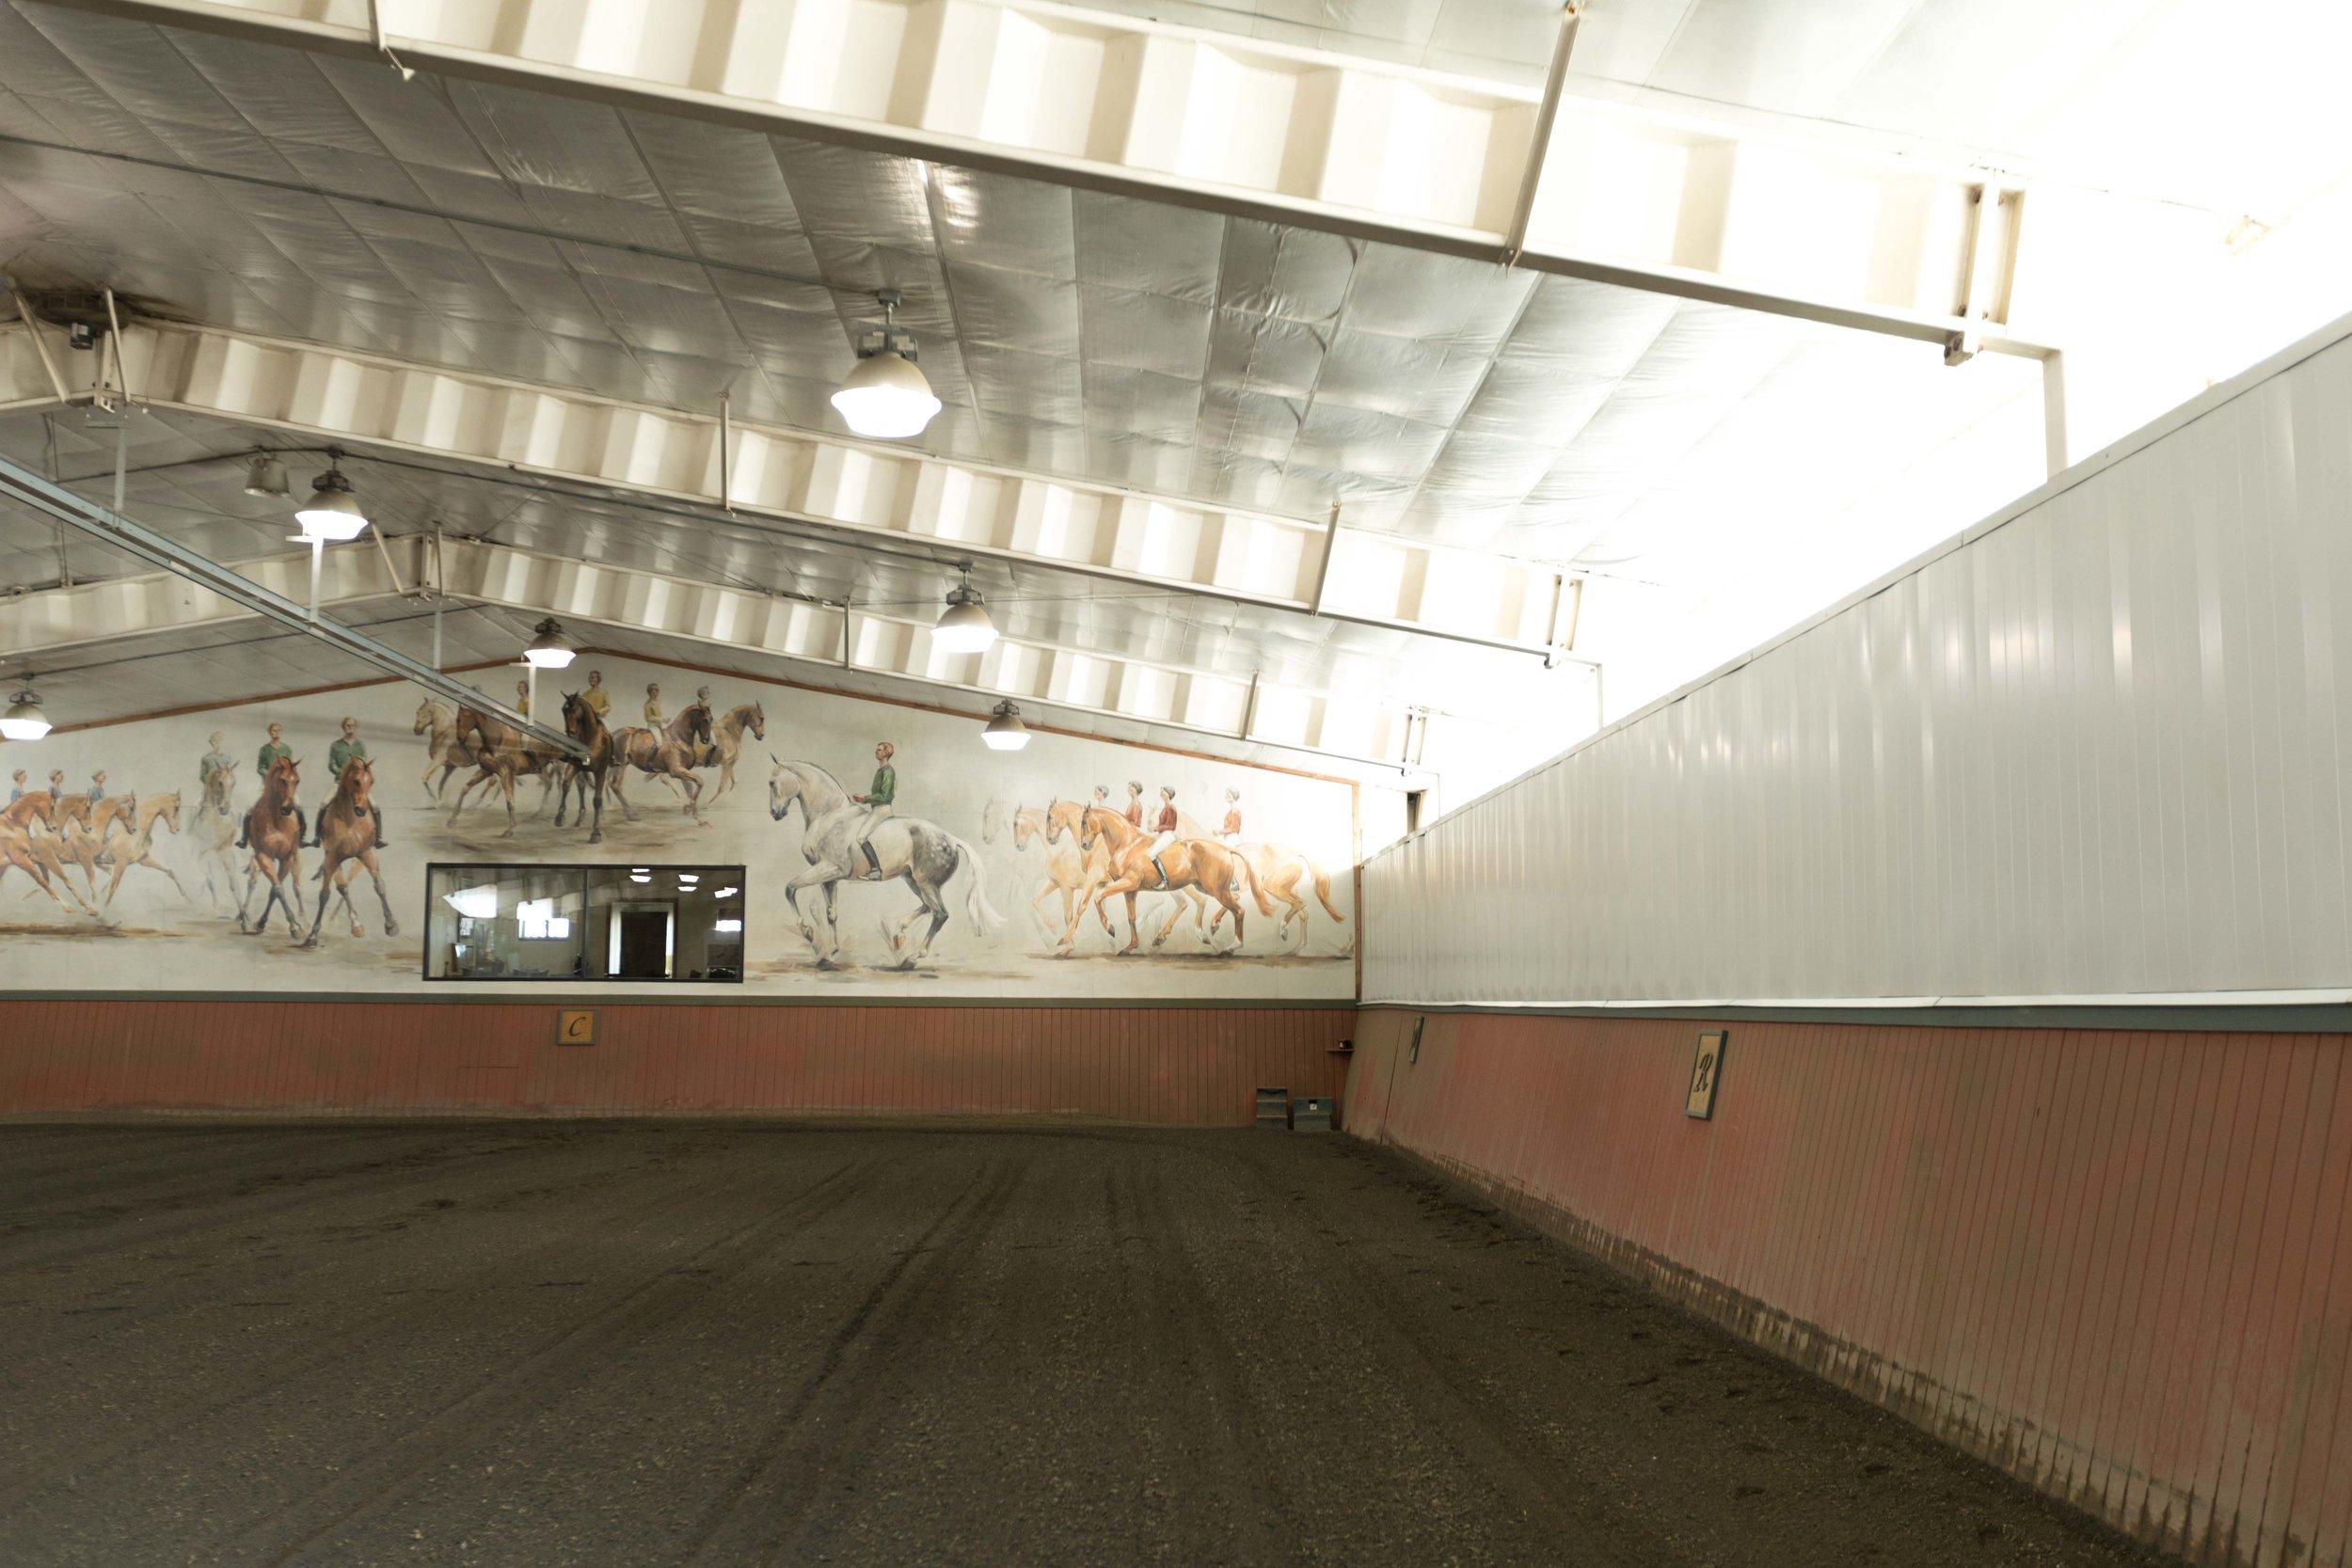 Colorado-Lifestyle-Photography-Jimena-Peck-Mind-Body-Horse-Yoga-Jessica-Greer-Dressage-Arena